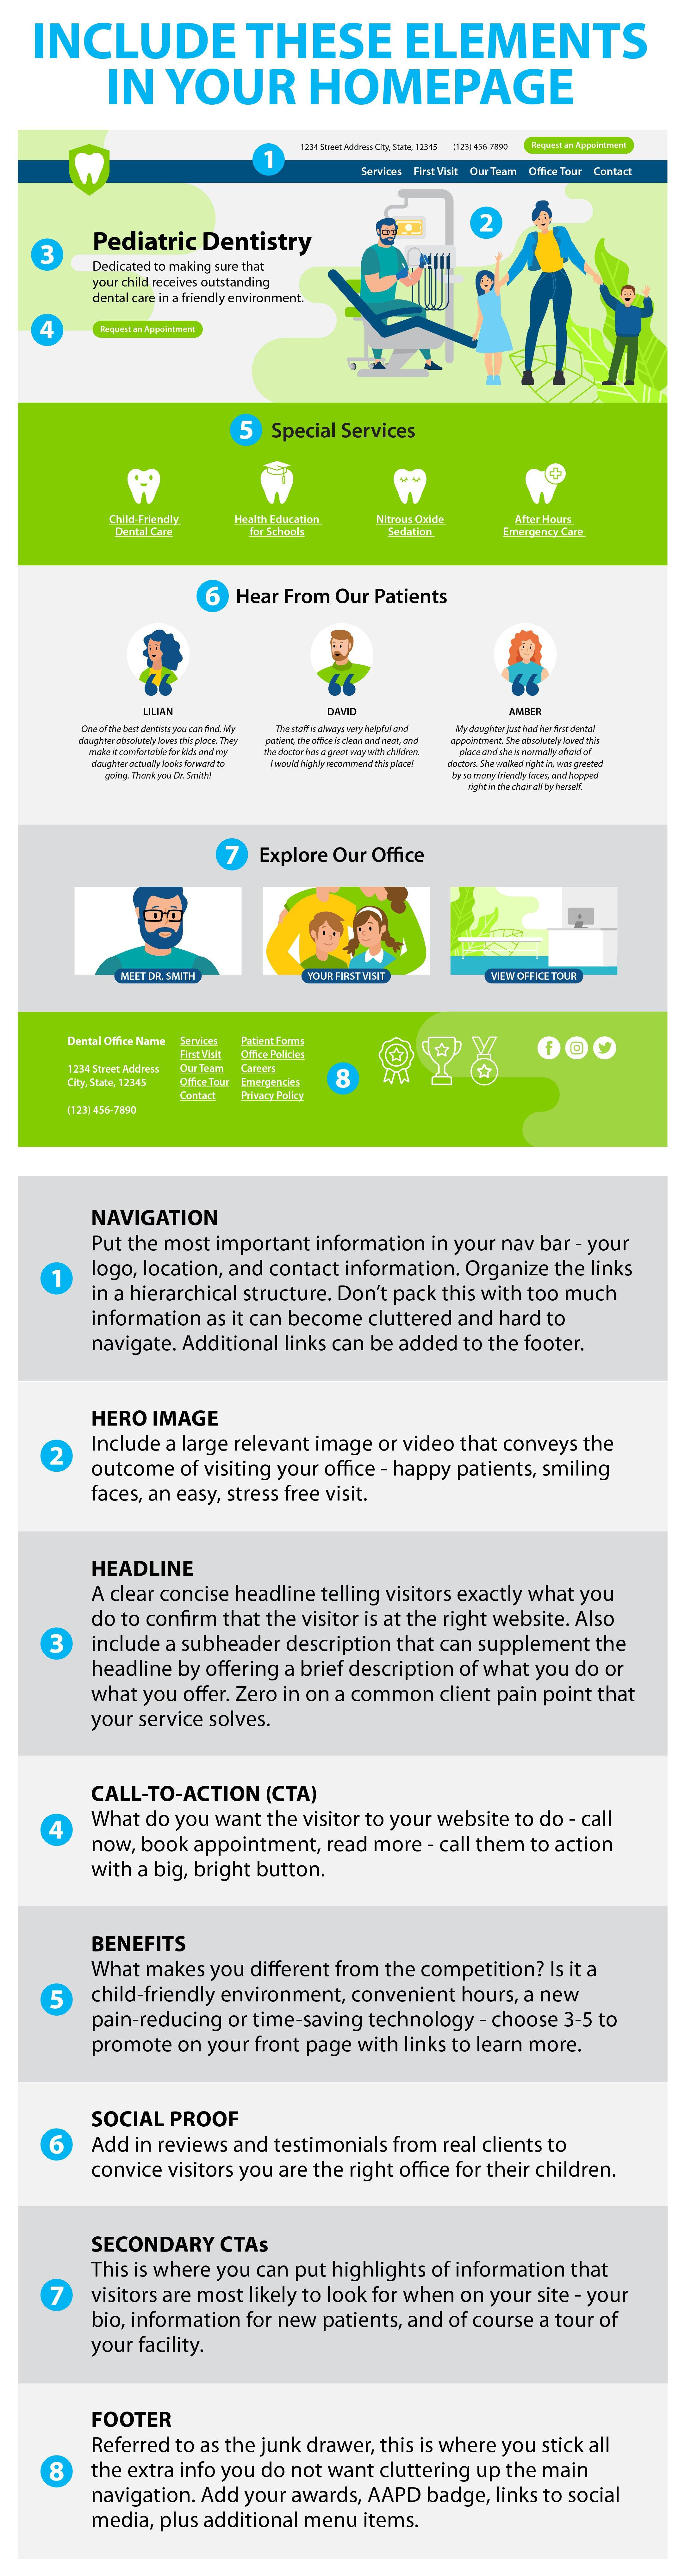 Dental Website Elements Infographic